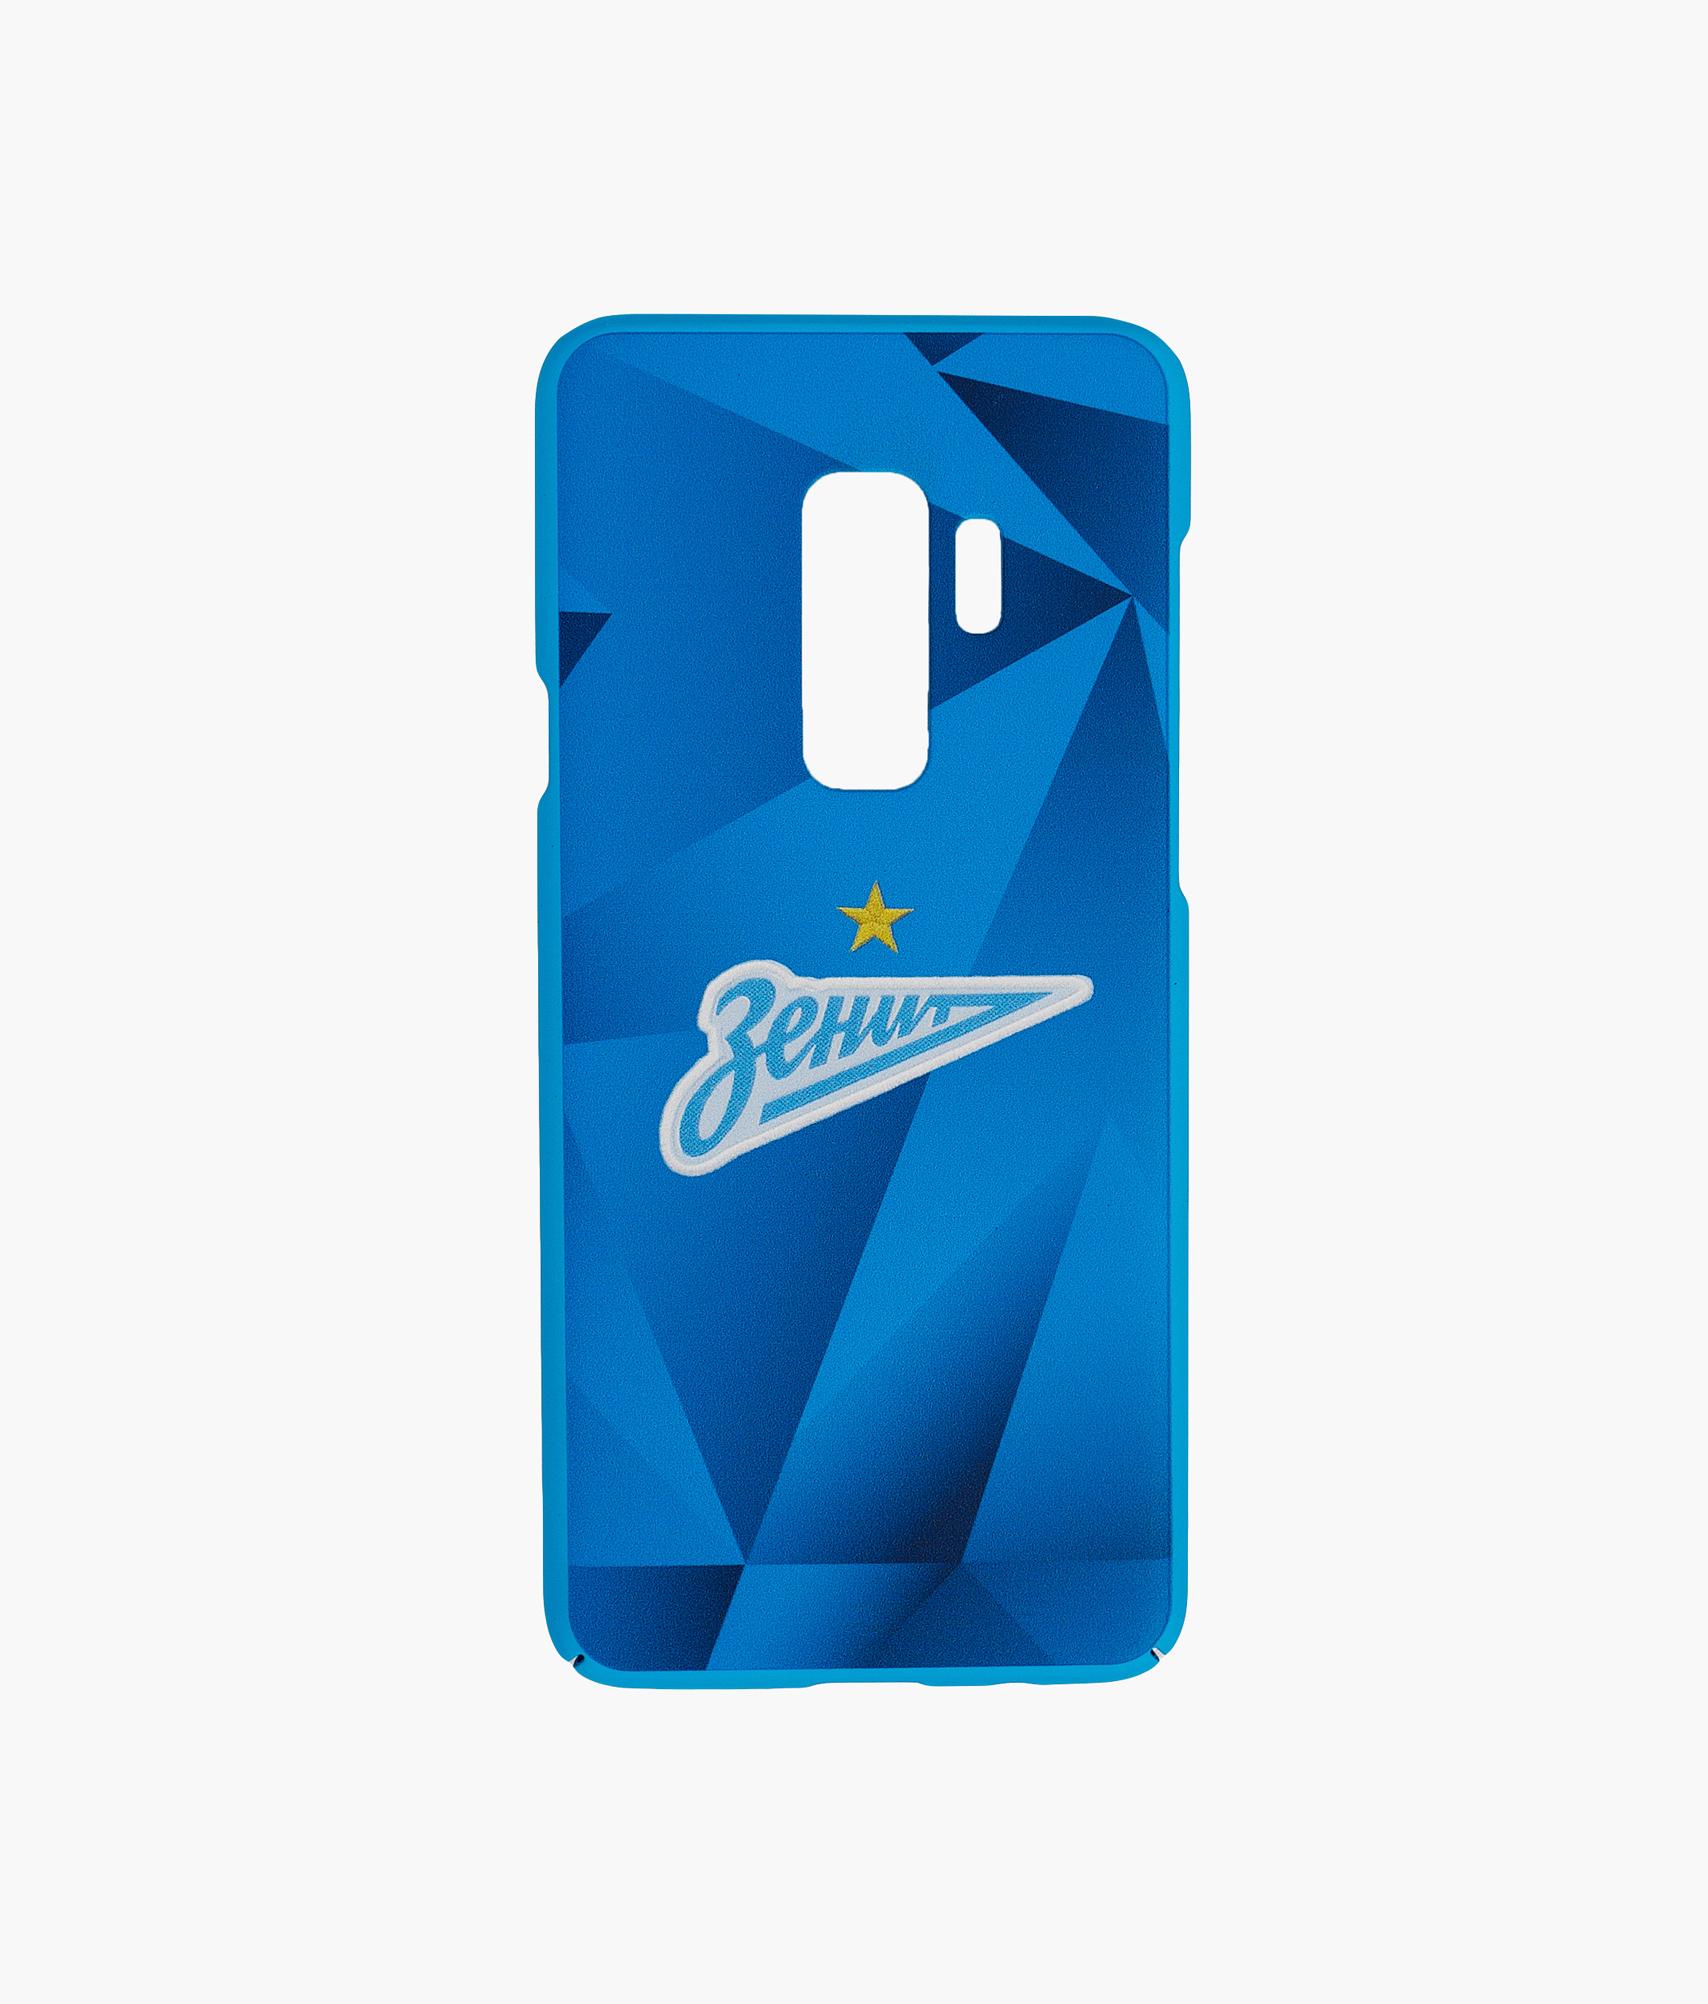 Фото - Чехол для Samsung Galaxy S9 Plus «Форма 2019/20» Зенит Цвет-Синий чехол для сотового телефона nillkin samsung a8 2018 чехол книжка sparkle розовый